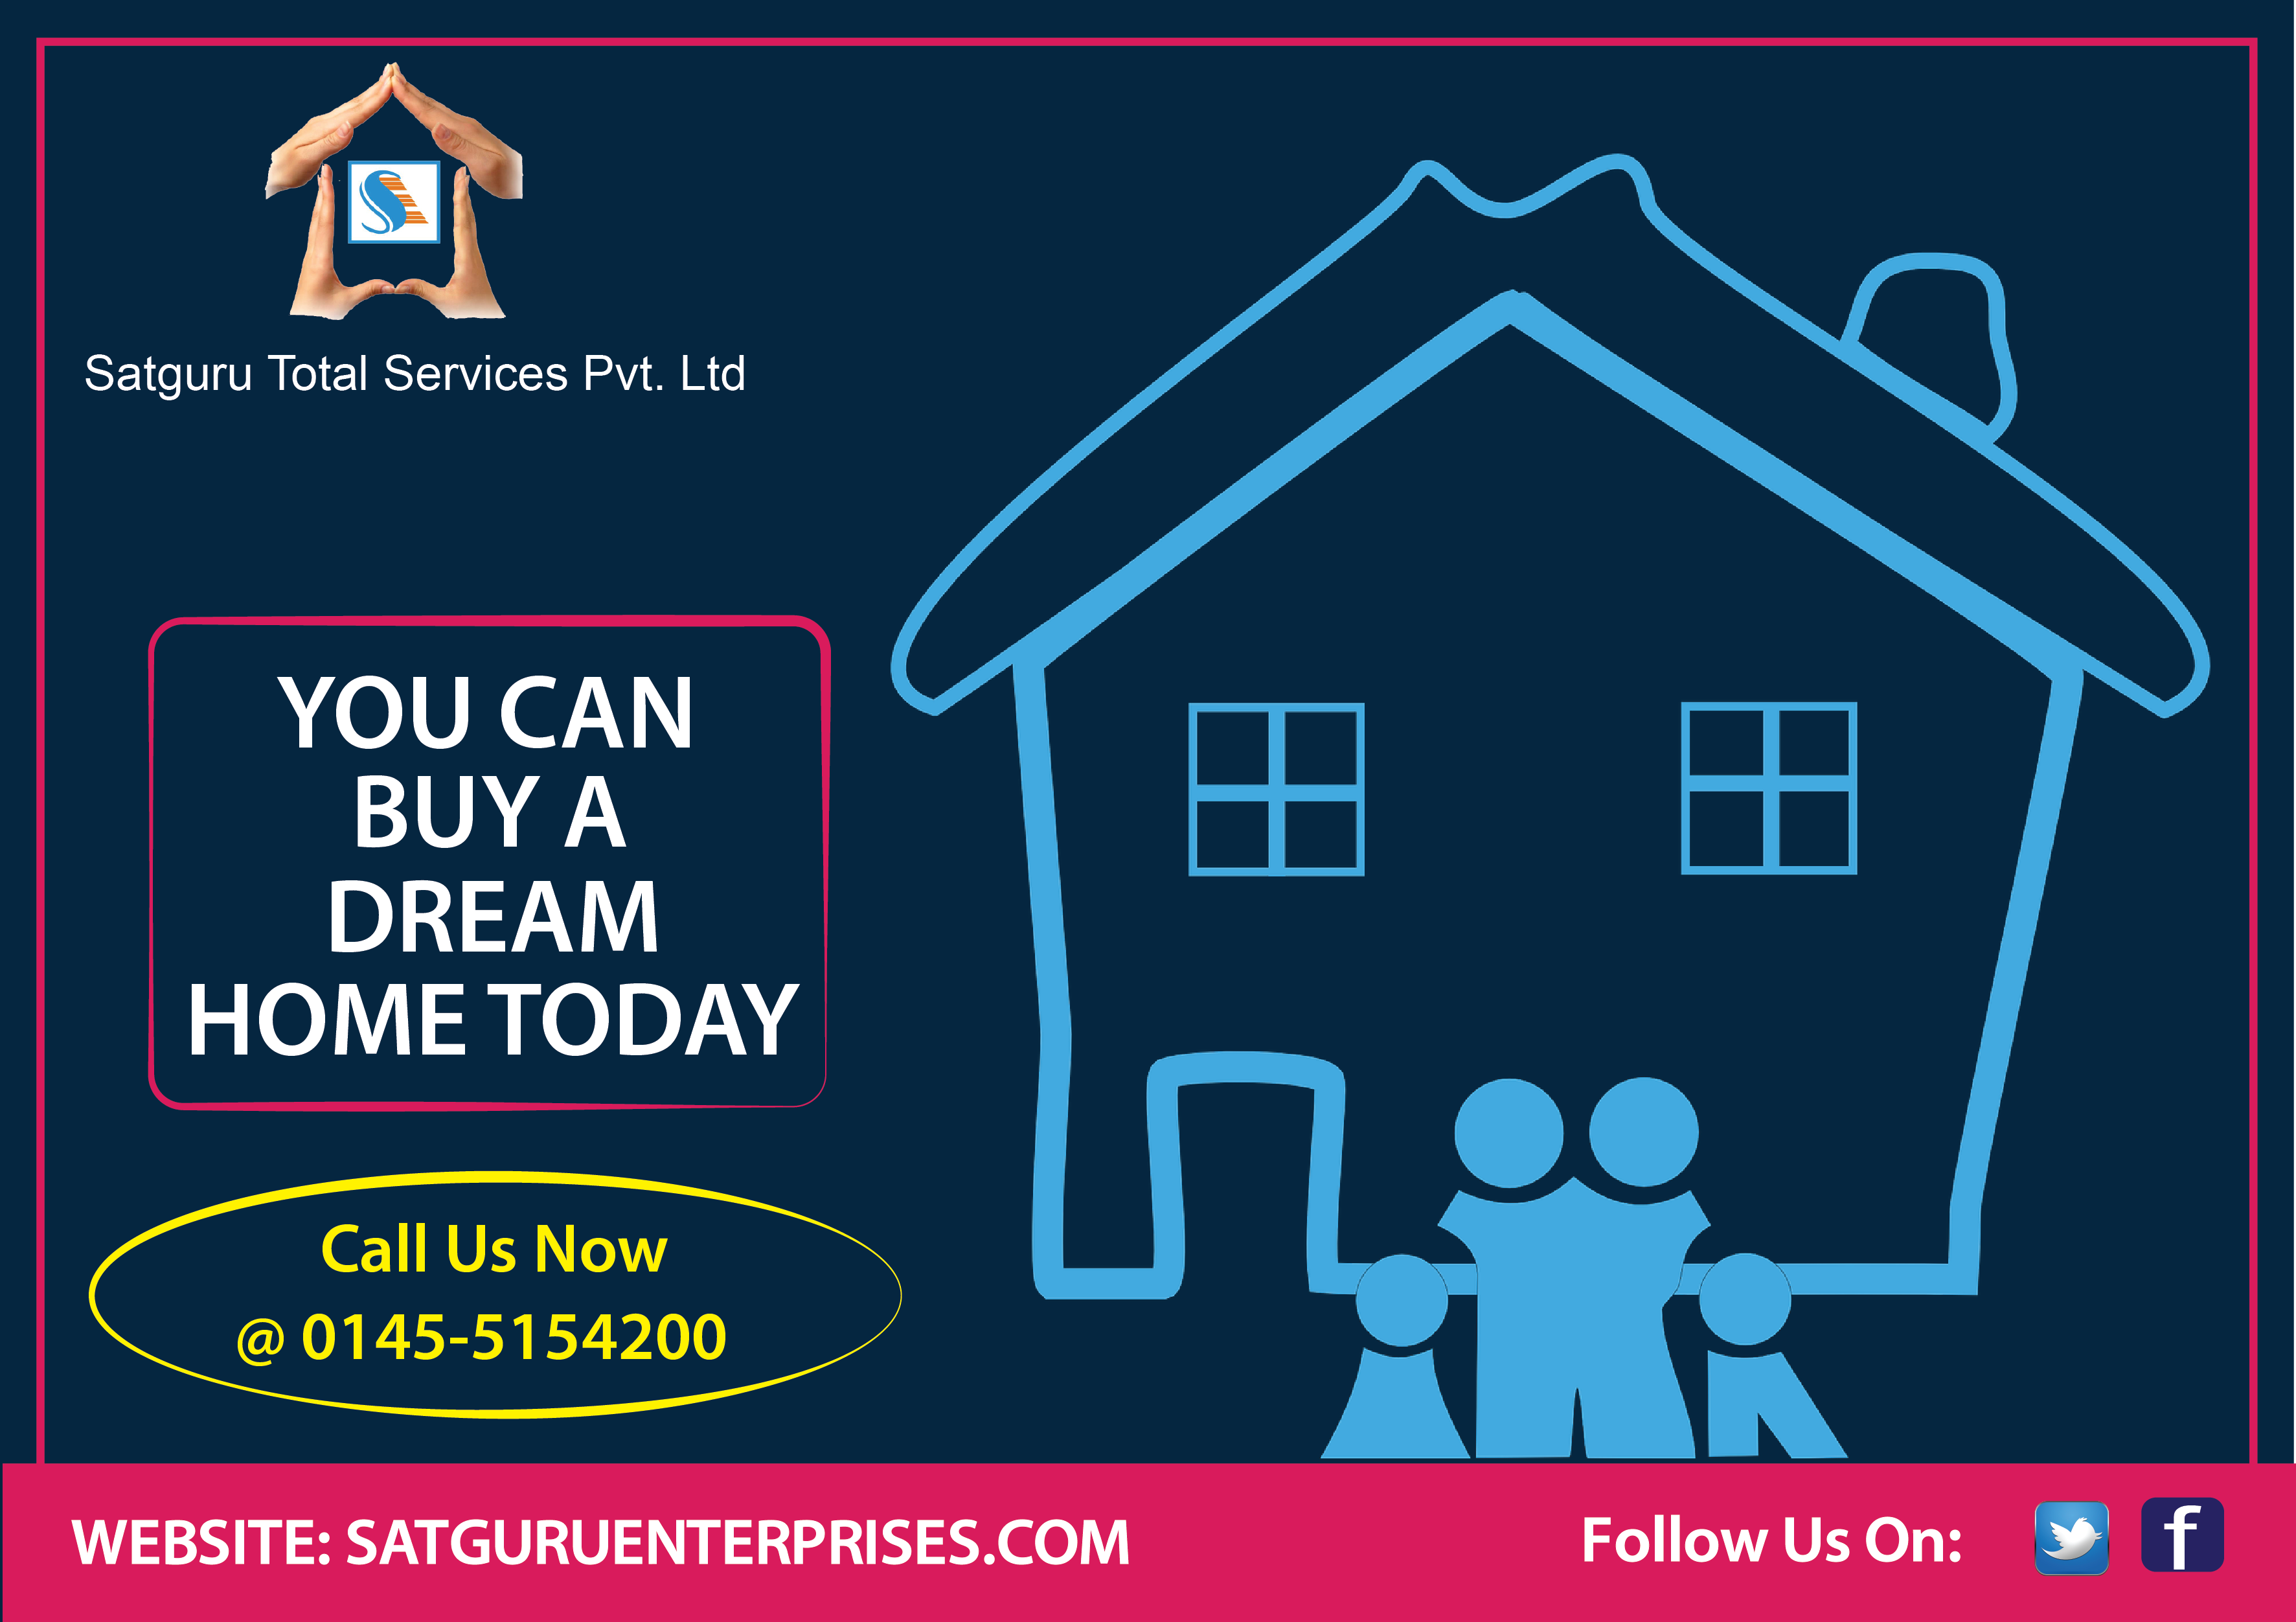 Home Loan Services By Satguru Total Services Pvt Ltd At Minimum Rates Of Interest